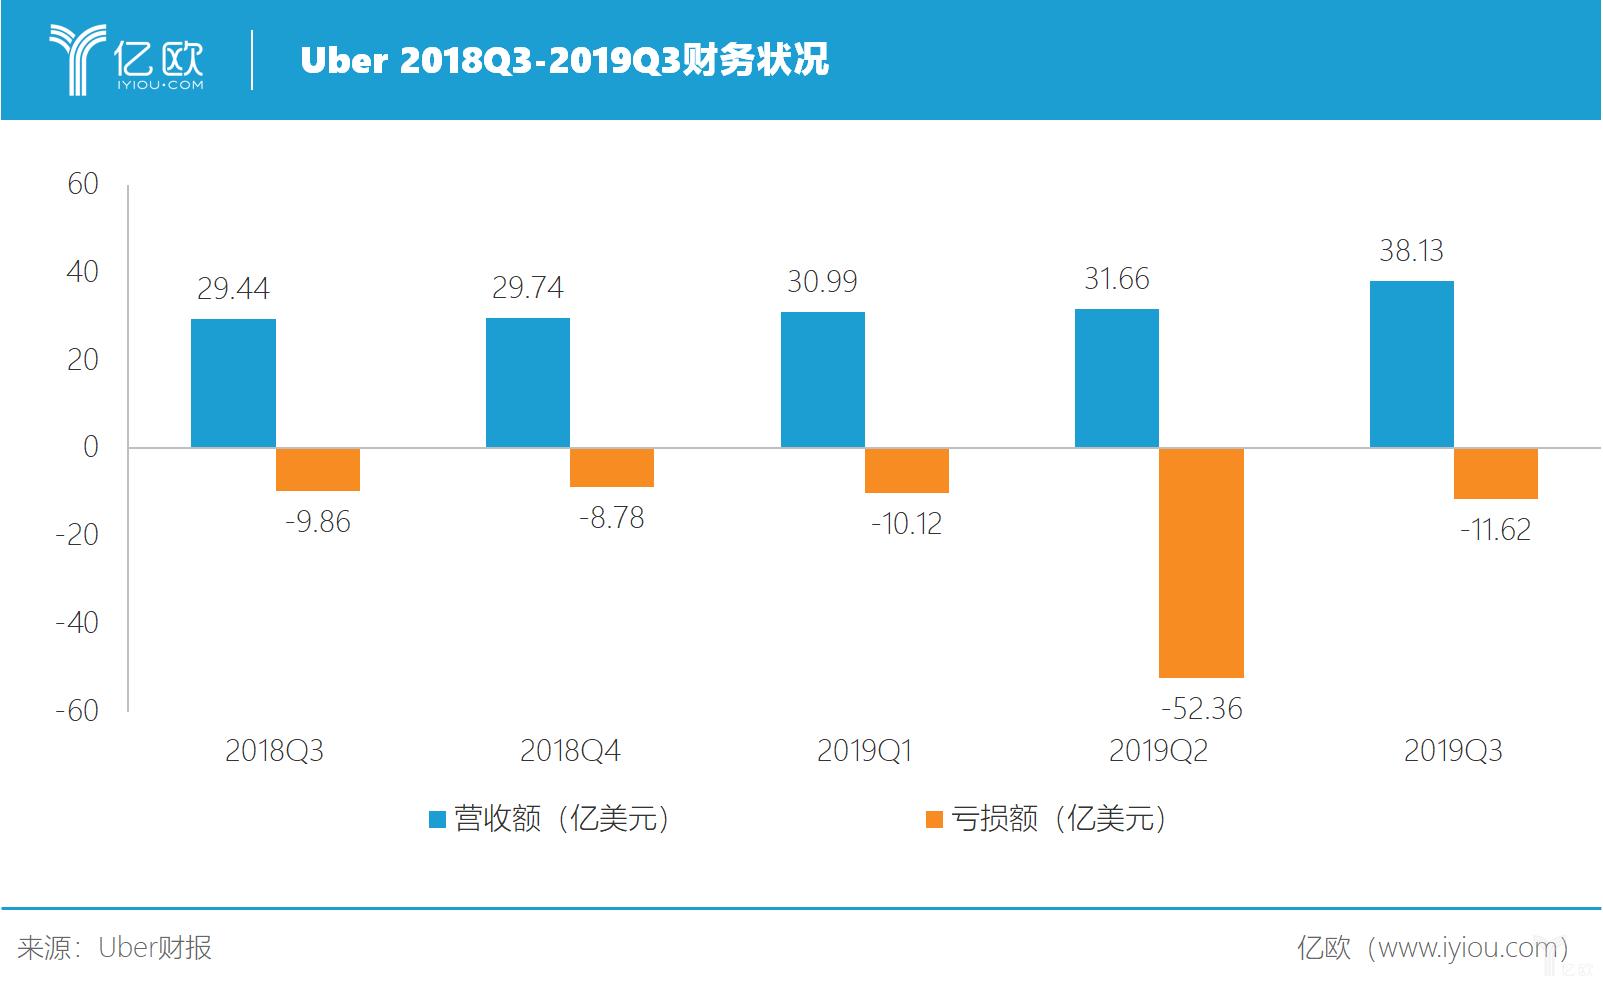 Uber 2018Q3-2019Q3财务状况